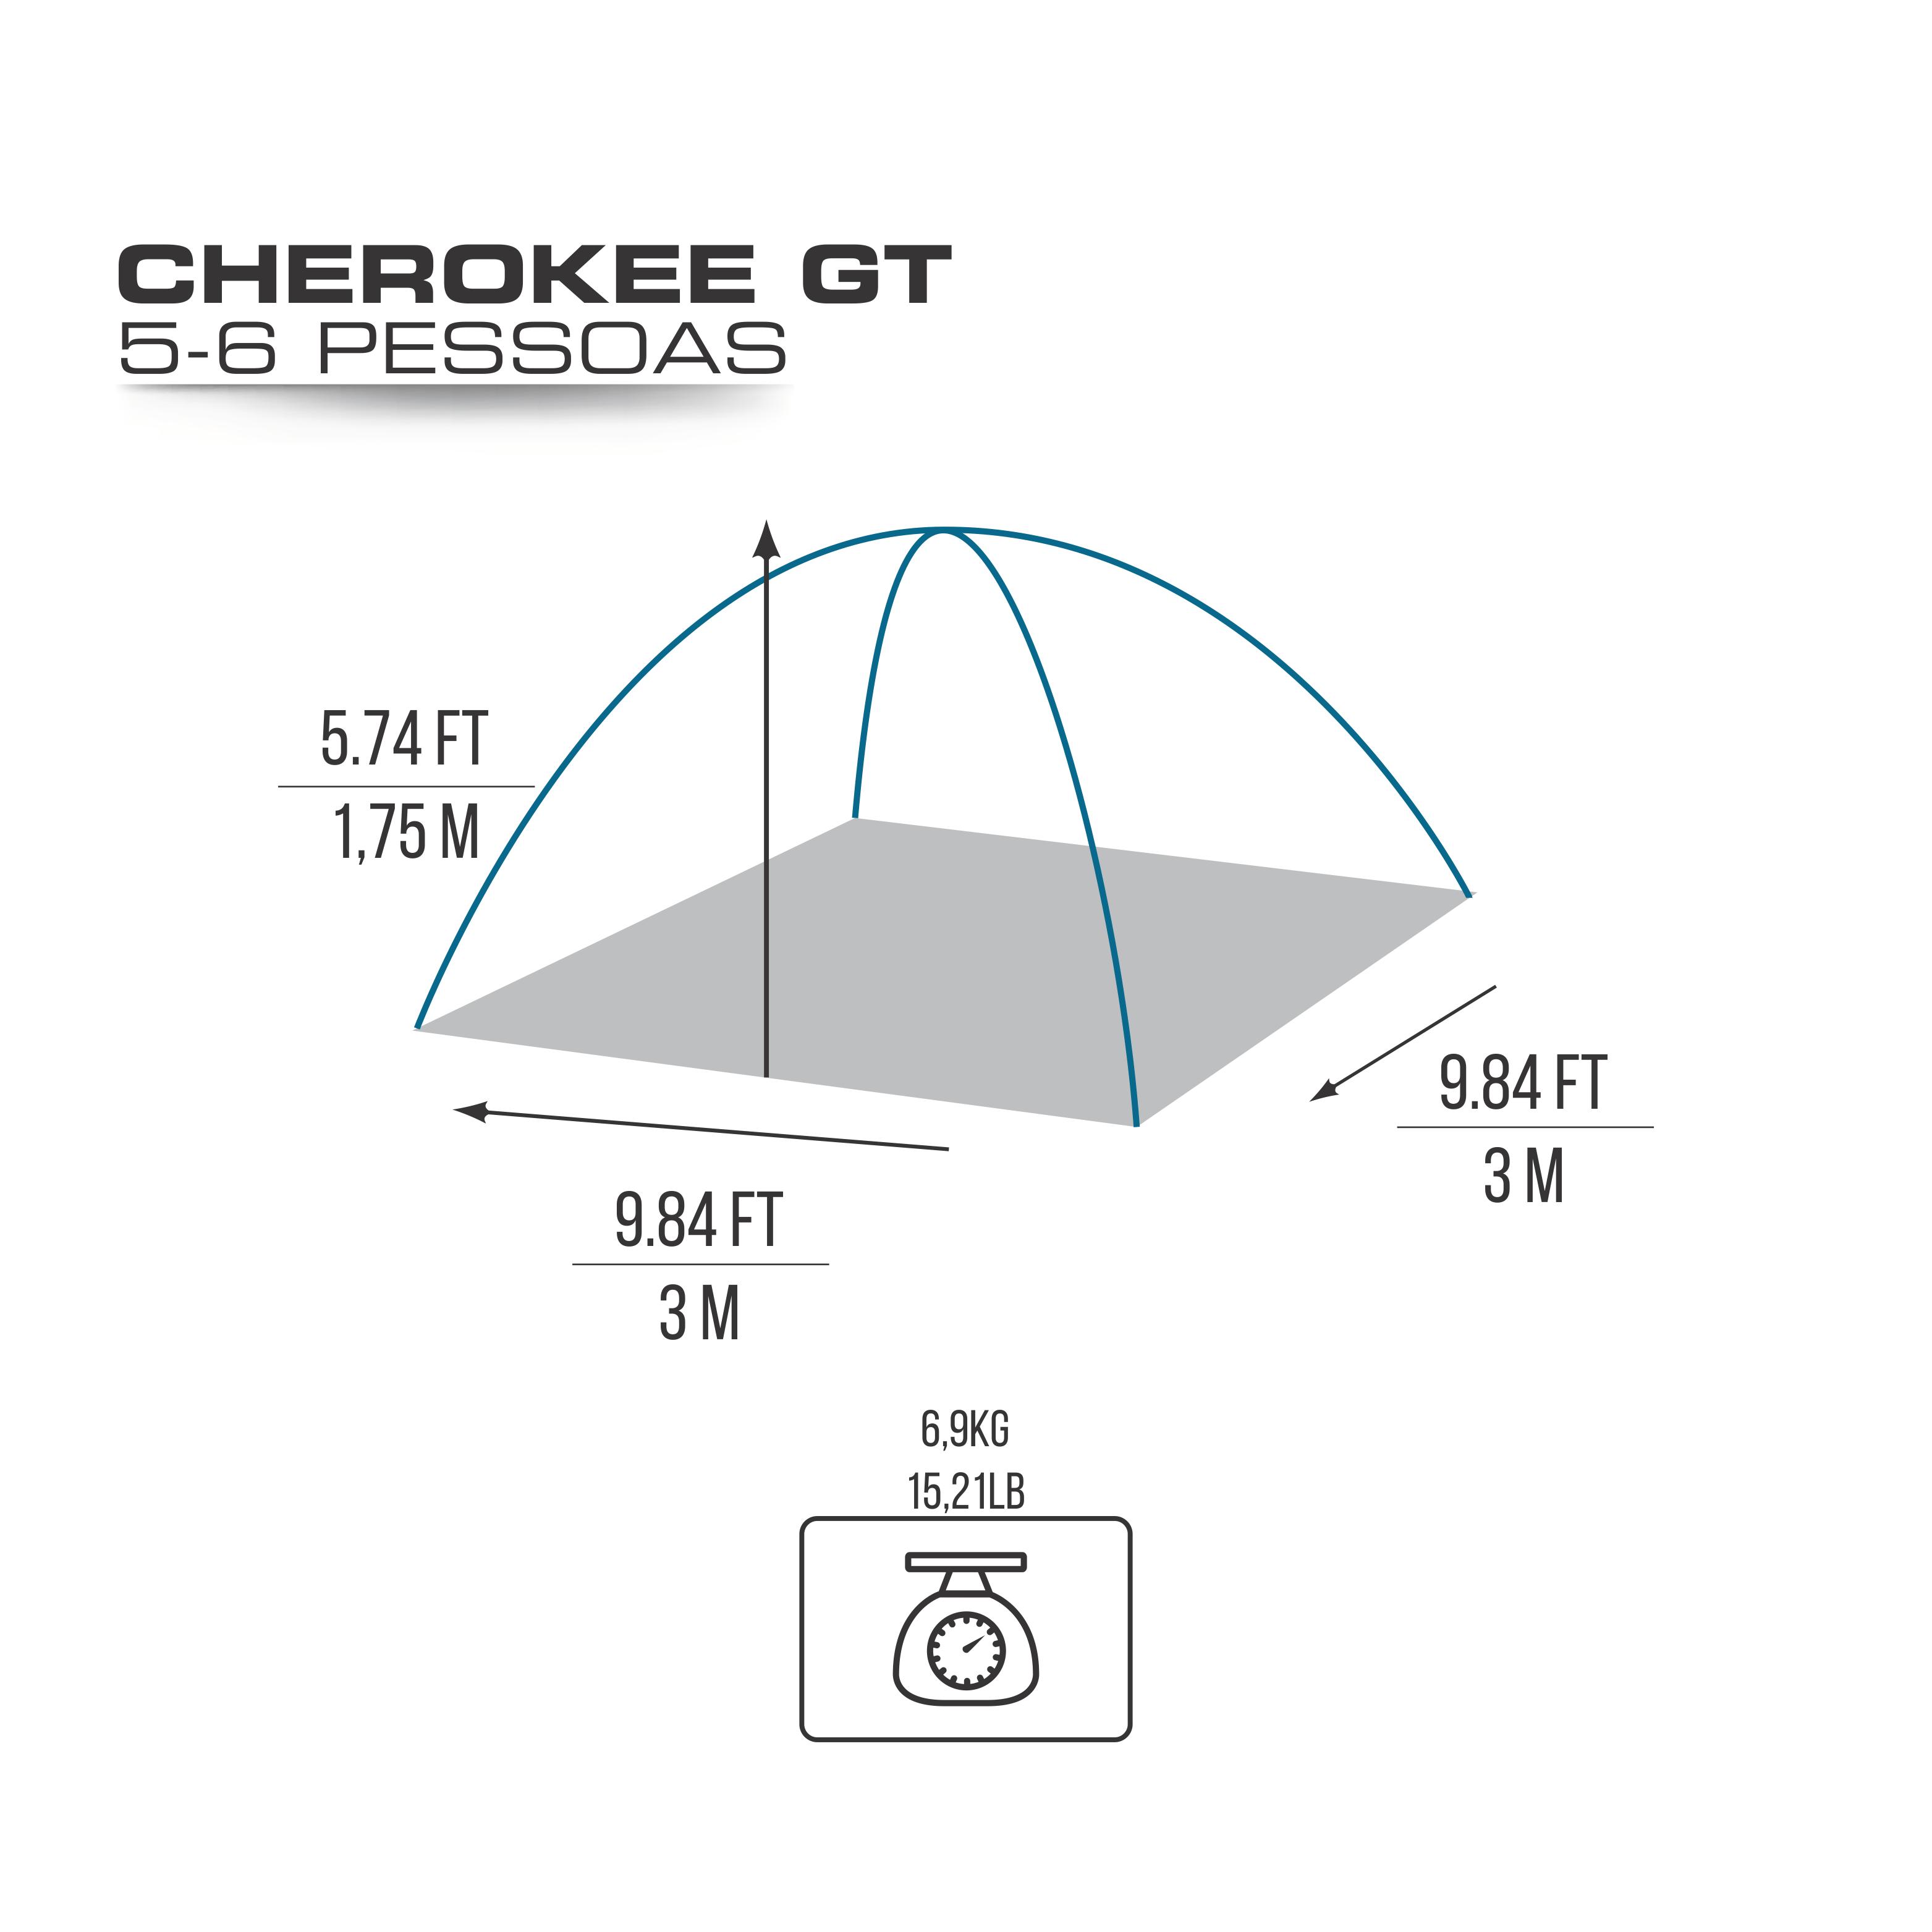 BARRACA CHEROKEE GT 5/6 PESSOAS - NTK